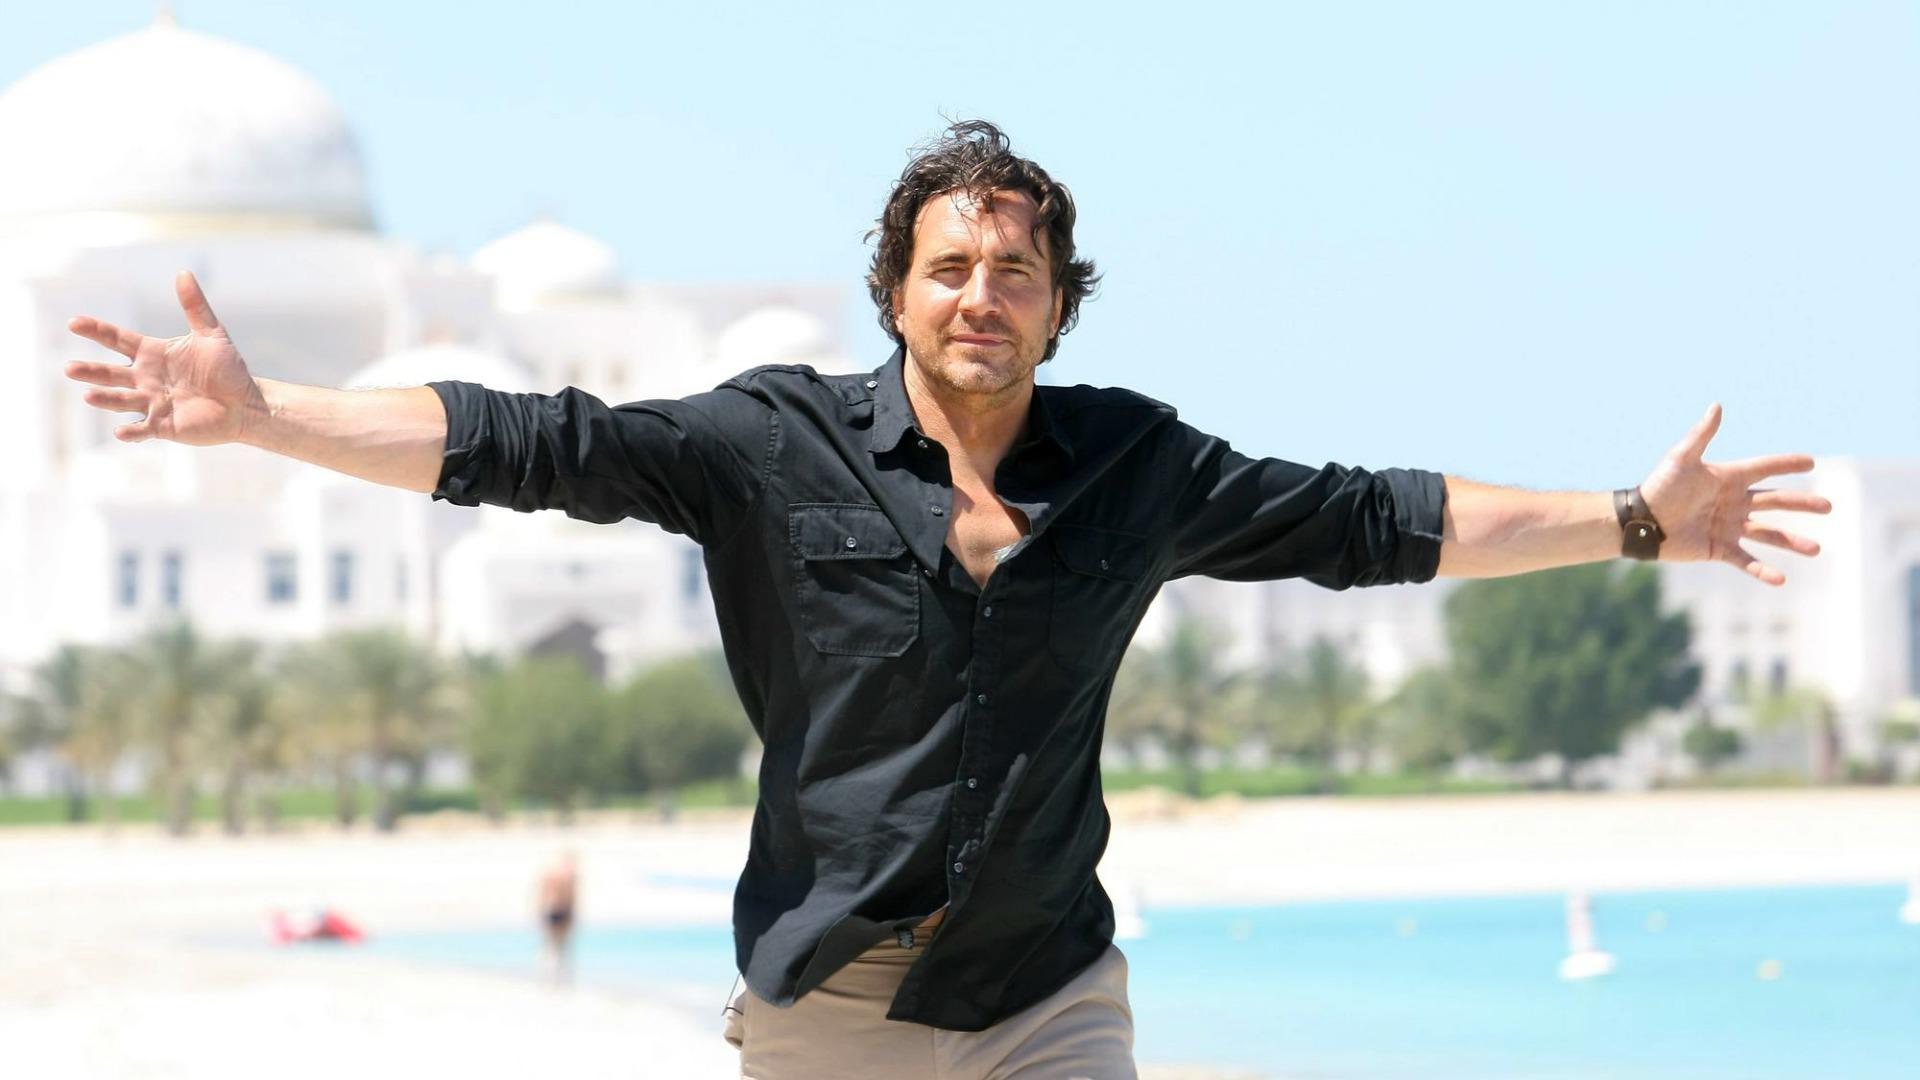 Thorsten Kaye embraced life in Dubai.